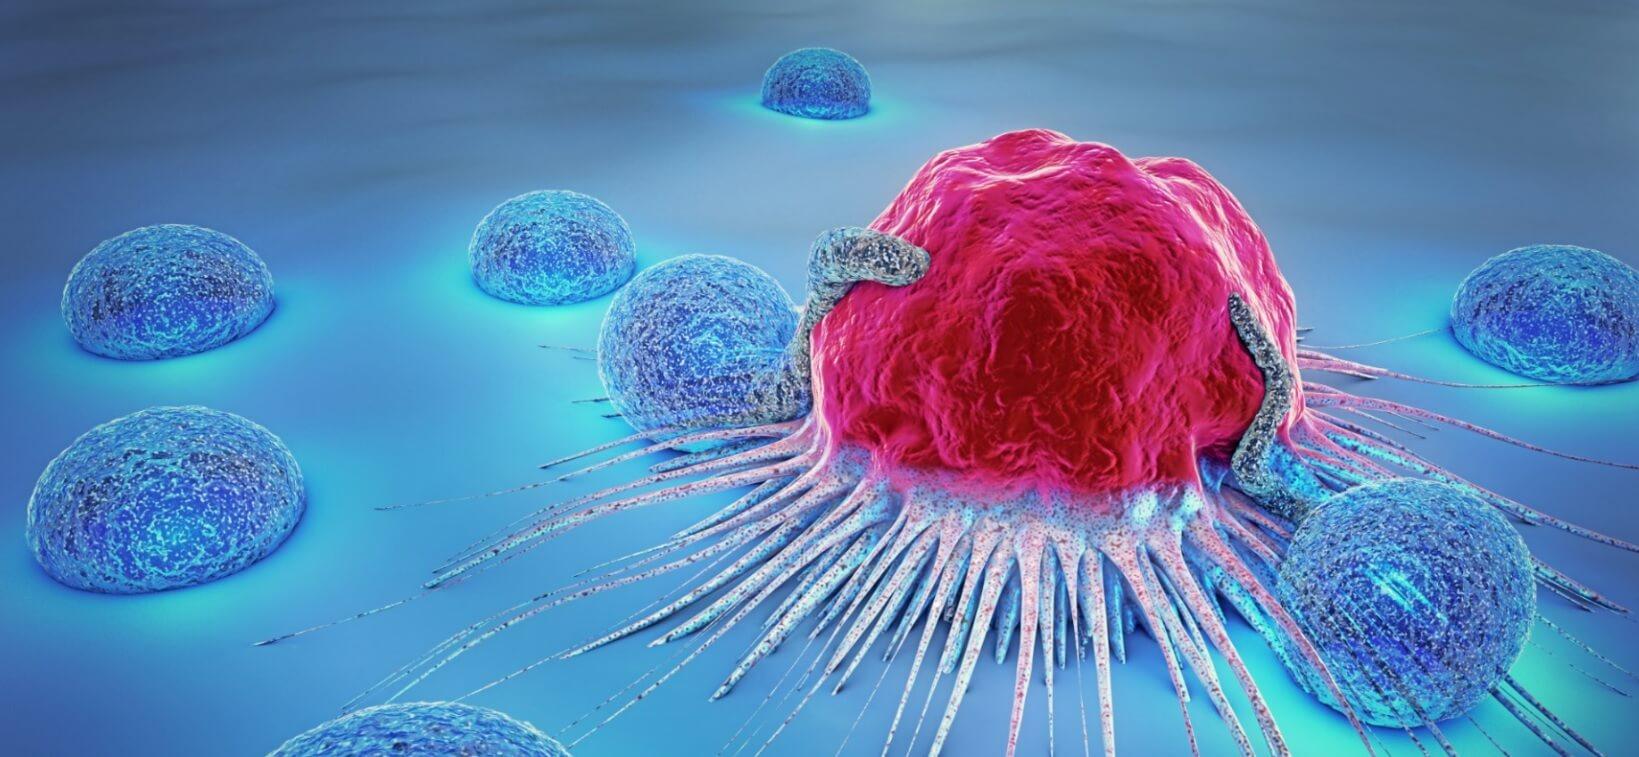 cellule car t cell therapie